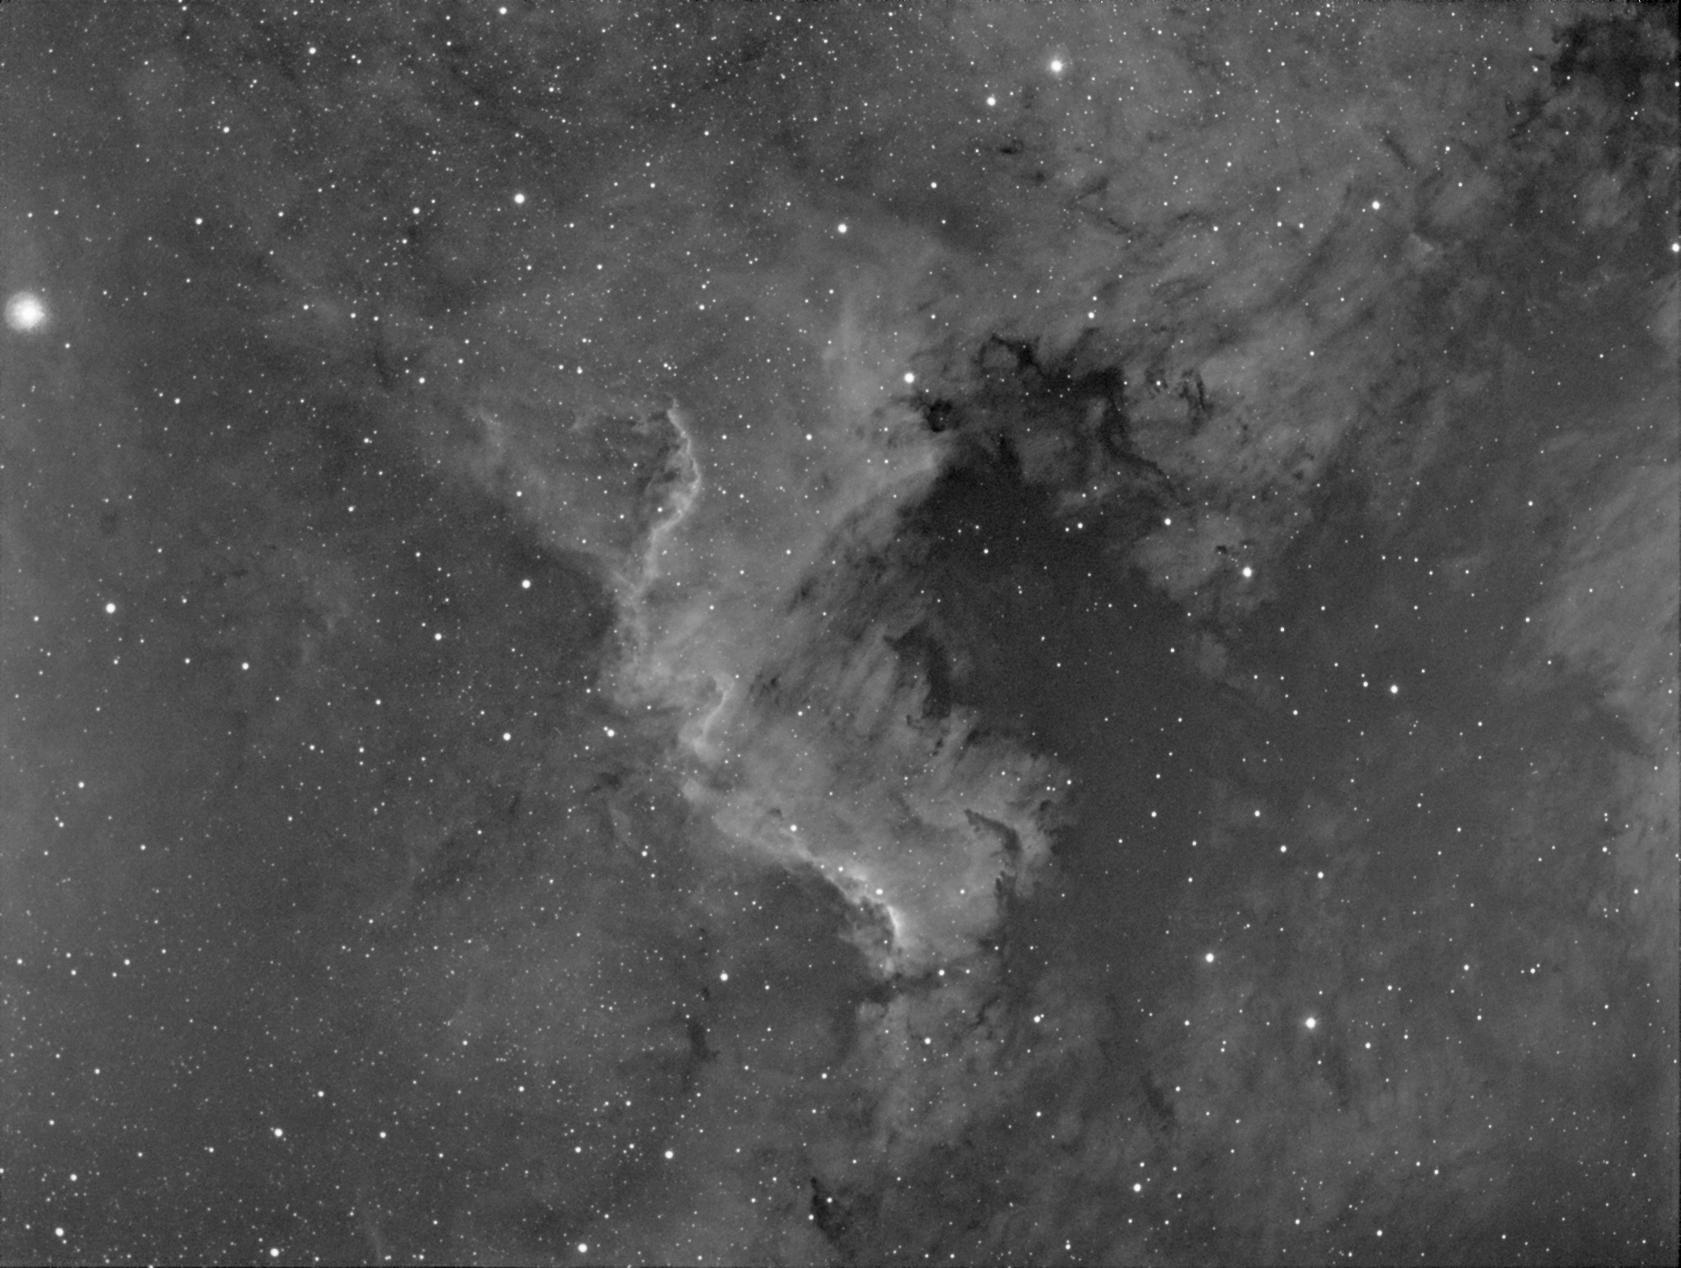 NGC7000_ha_2x2_6600s_atik383_sdhf75_cgem_SMV_DAVI